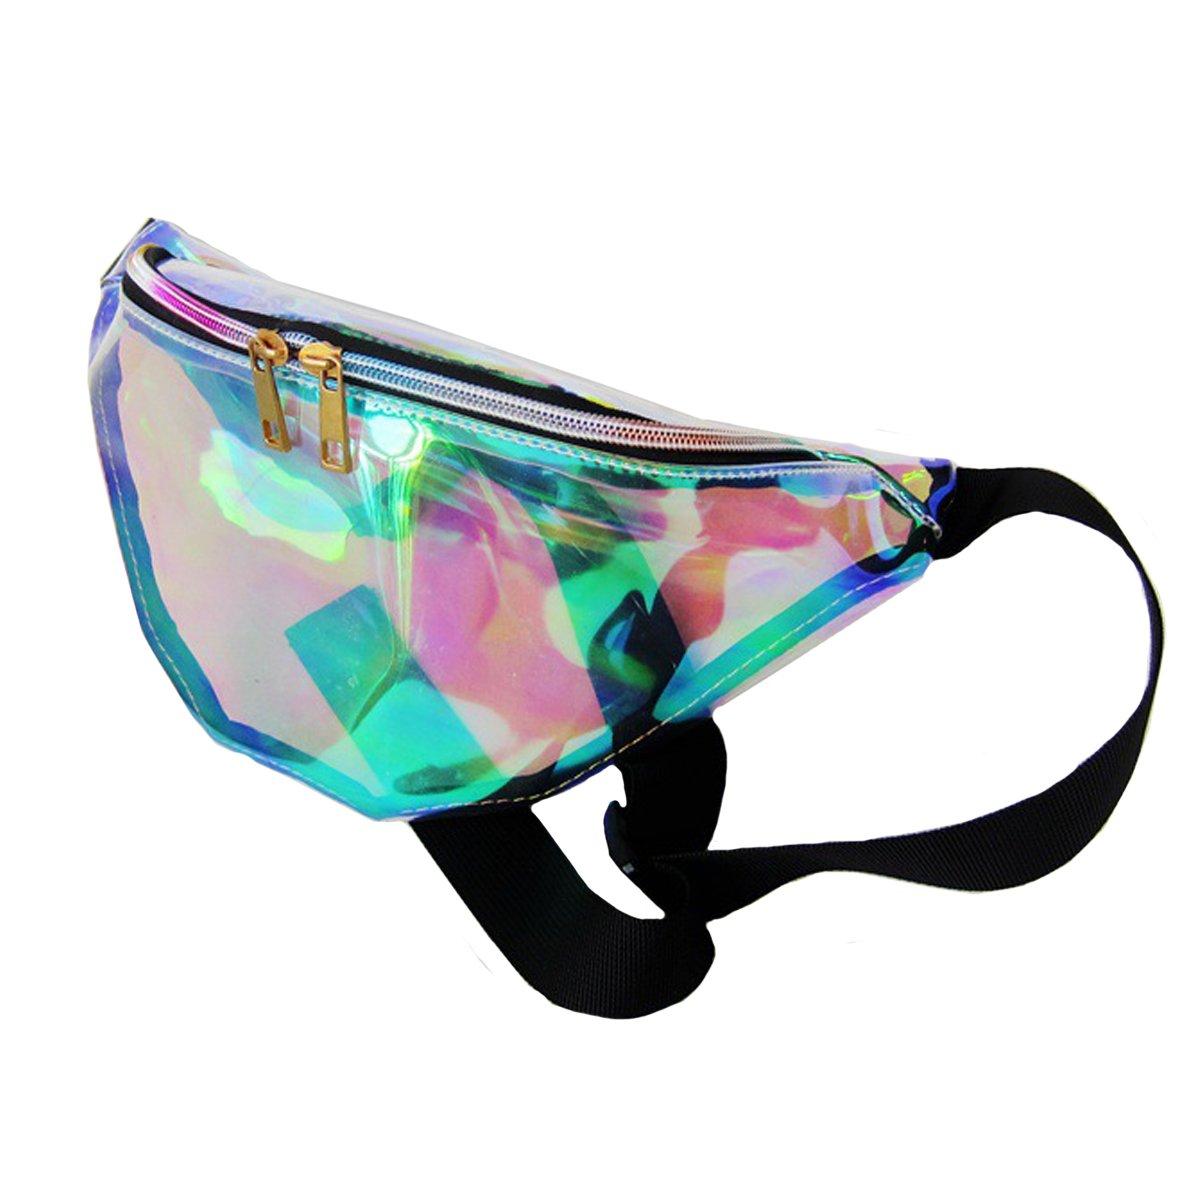 Dolores Women's PVC Hologram Fanny Pack Belt Waist Bum Bag Laser Travel Beach Purse, Iridescence